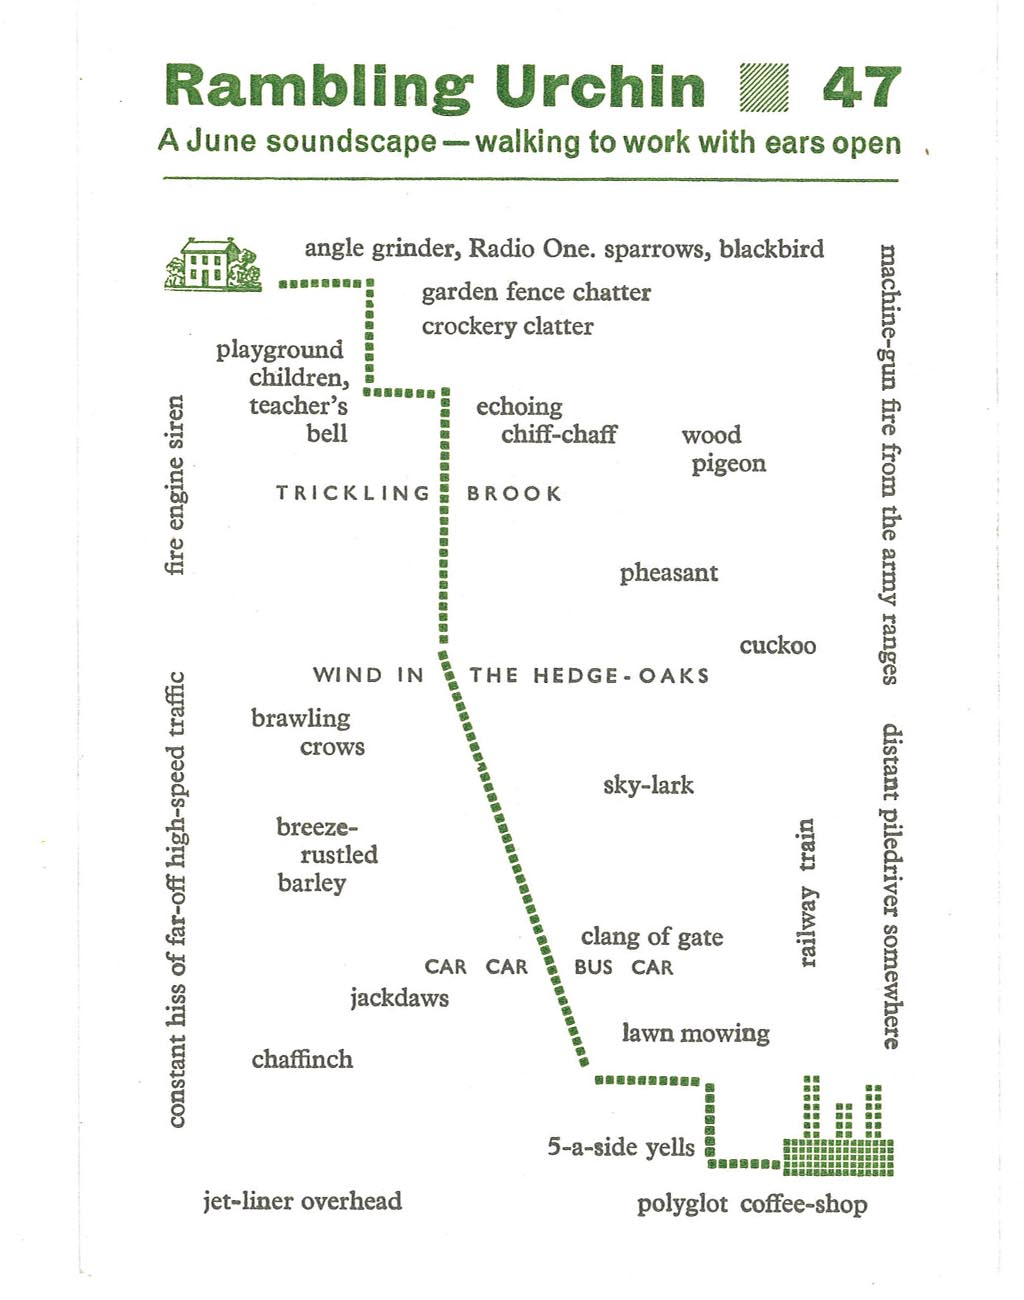 Rambling Urchin 47: A June soundscape- walking to work with ears open. (Hedgehog Press)